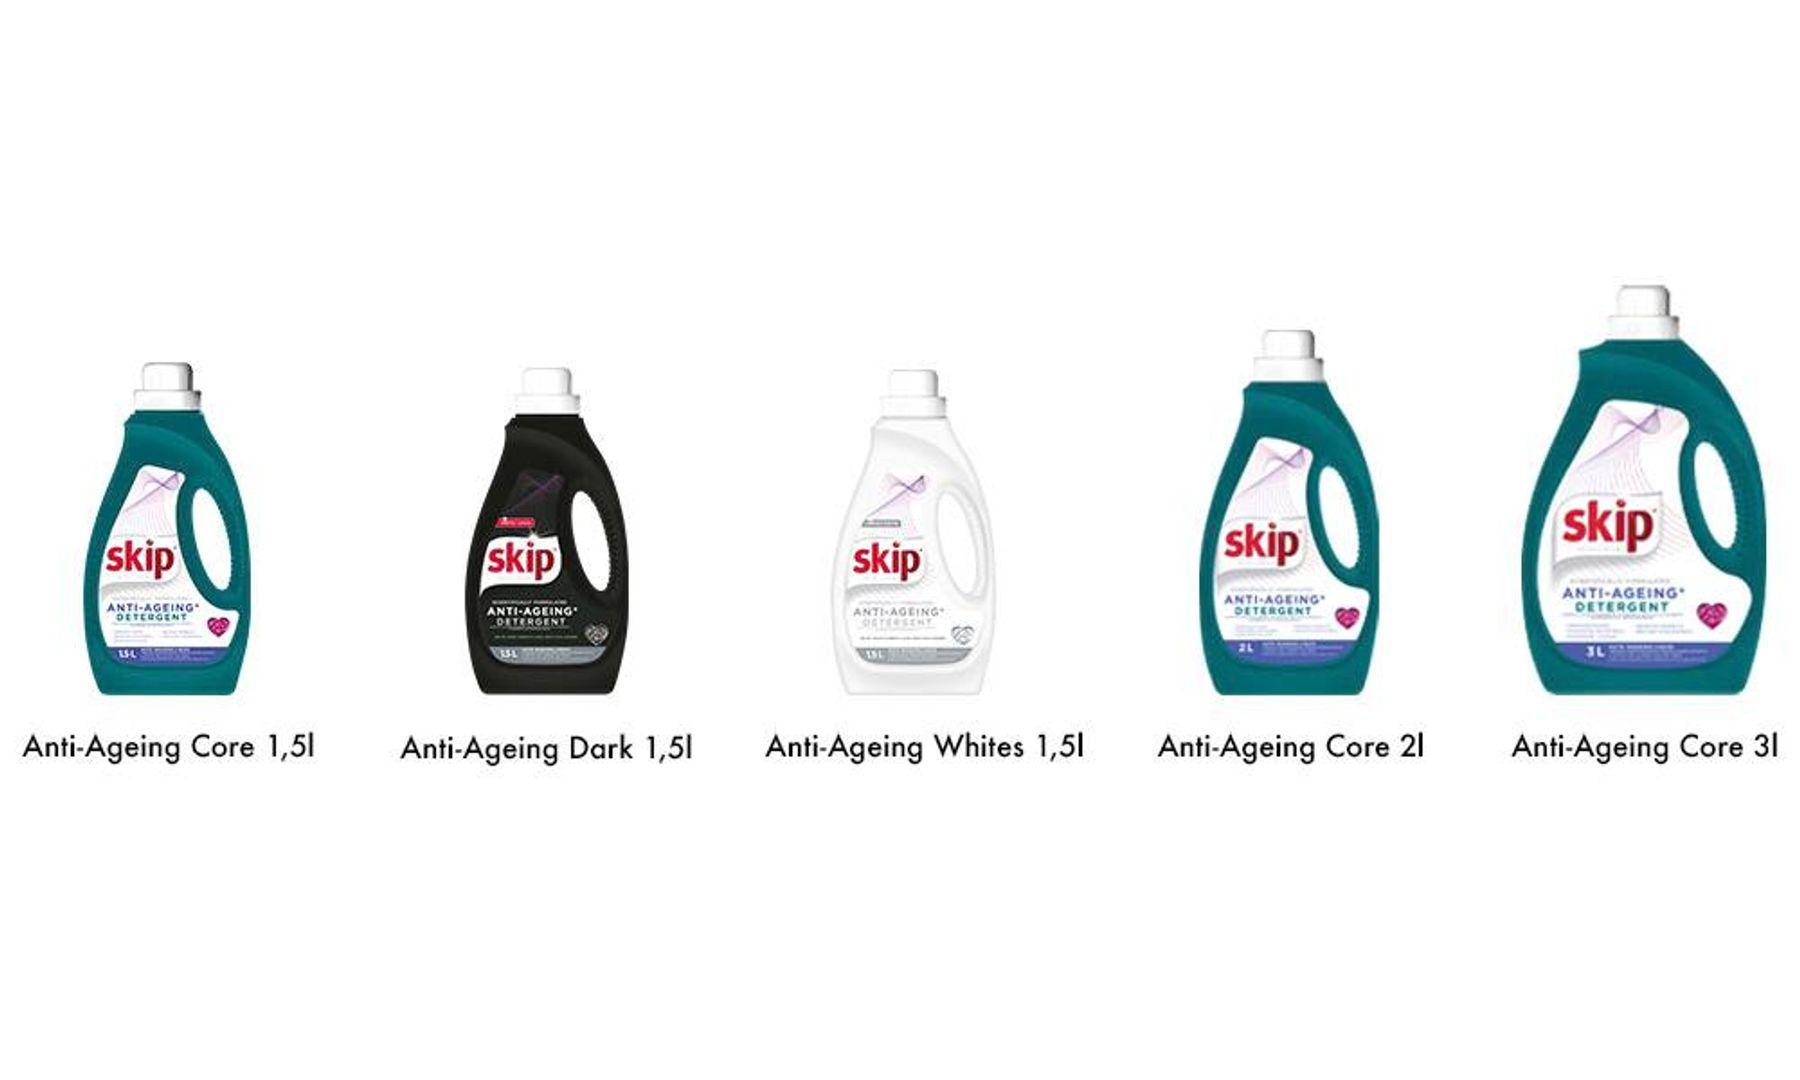 Skip 3 x Anti-Aging 1,5l Bottles